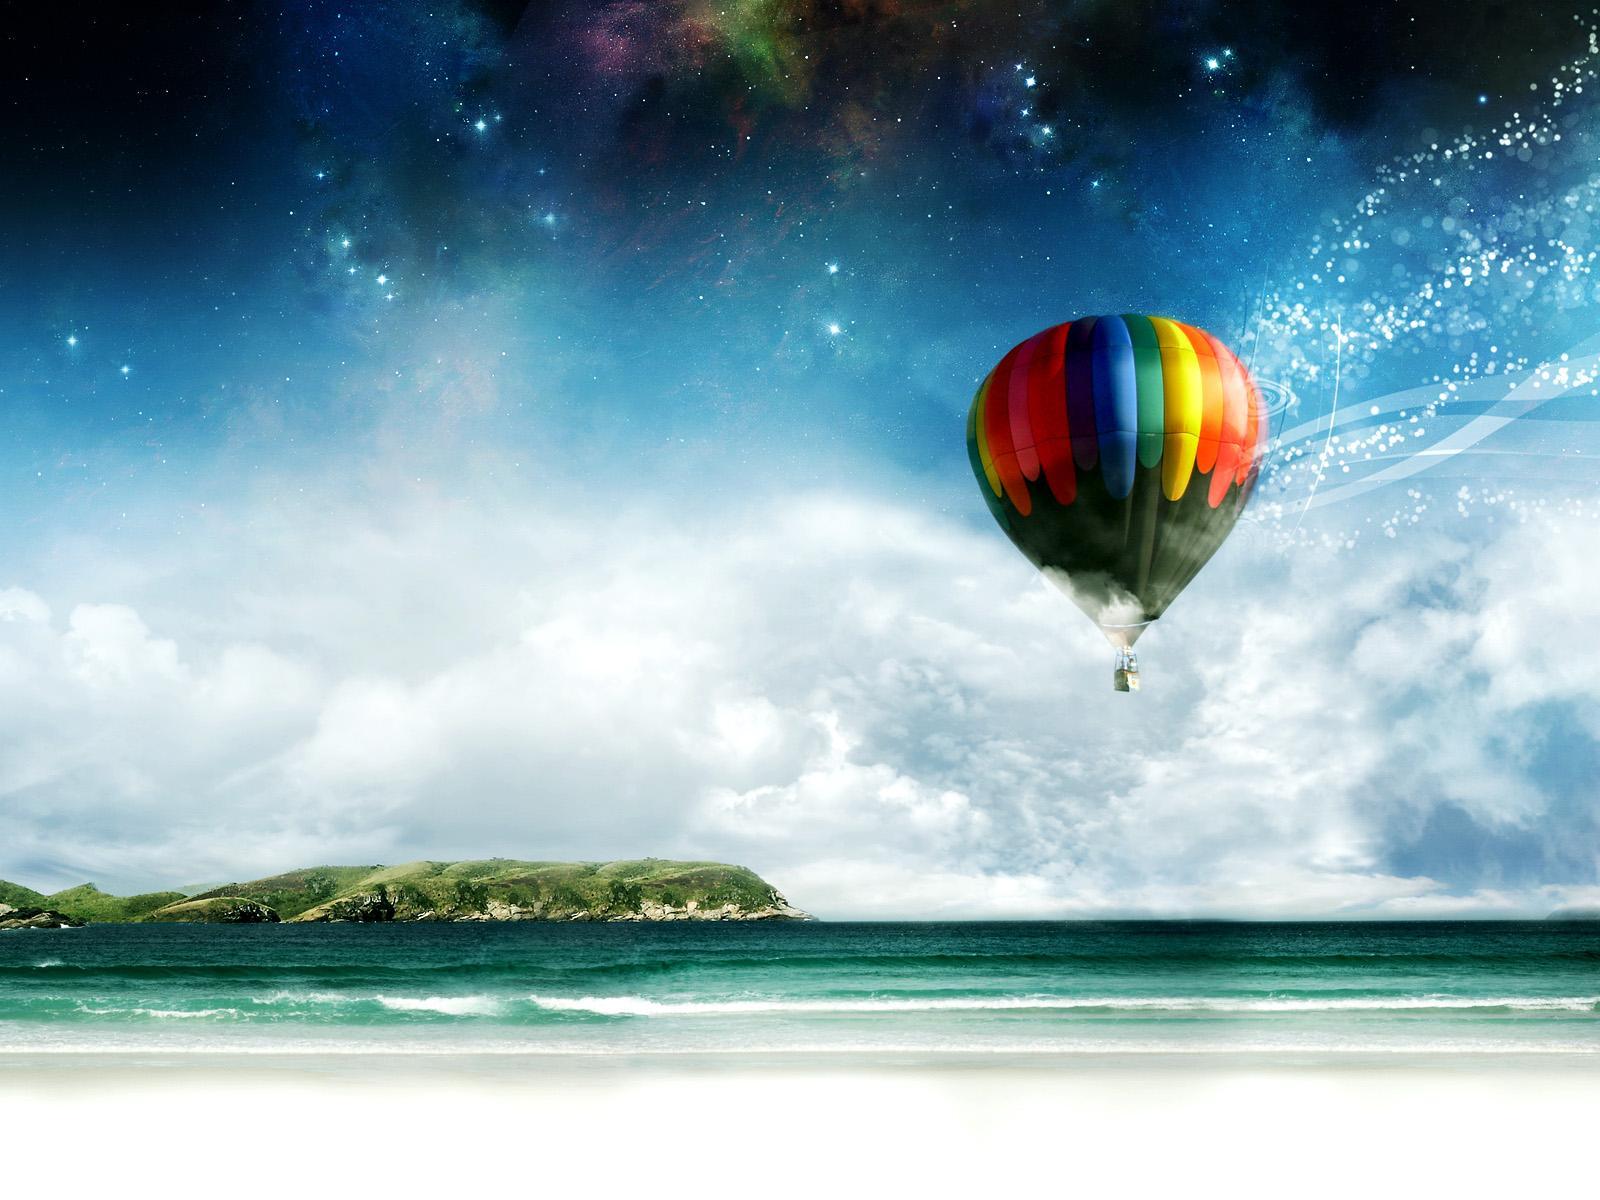 Free Hot Air Balloon Wallpaper ...